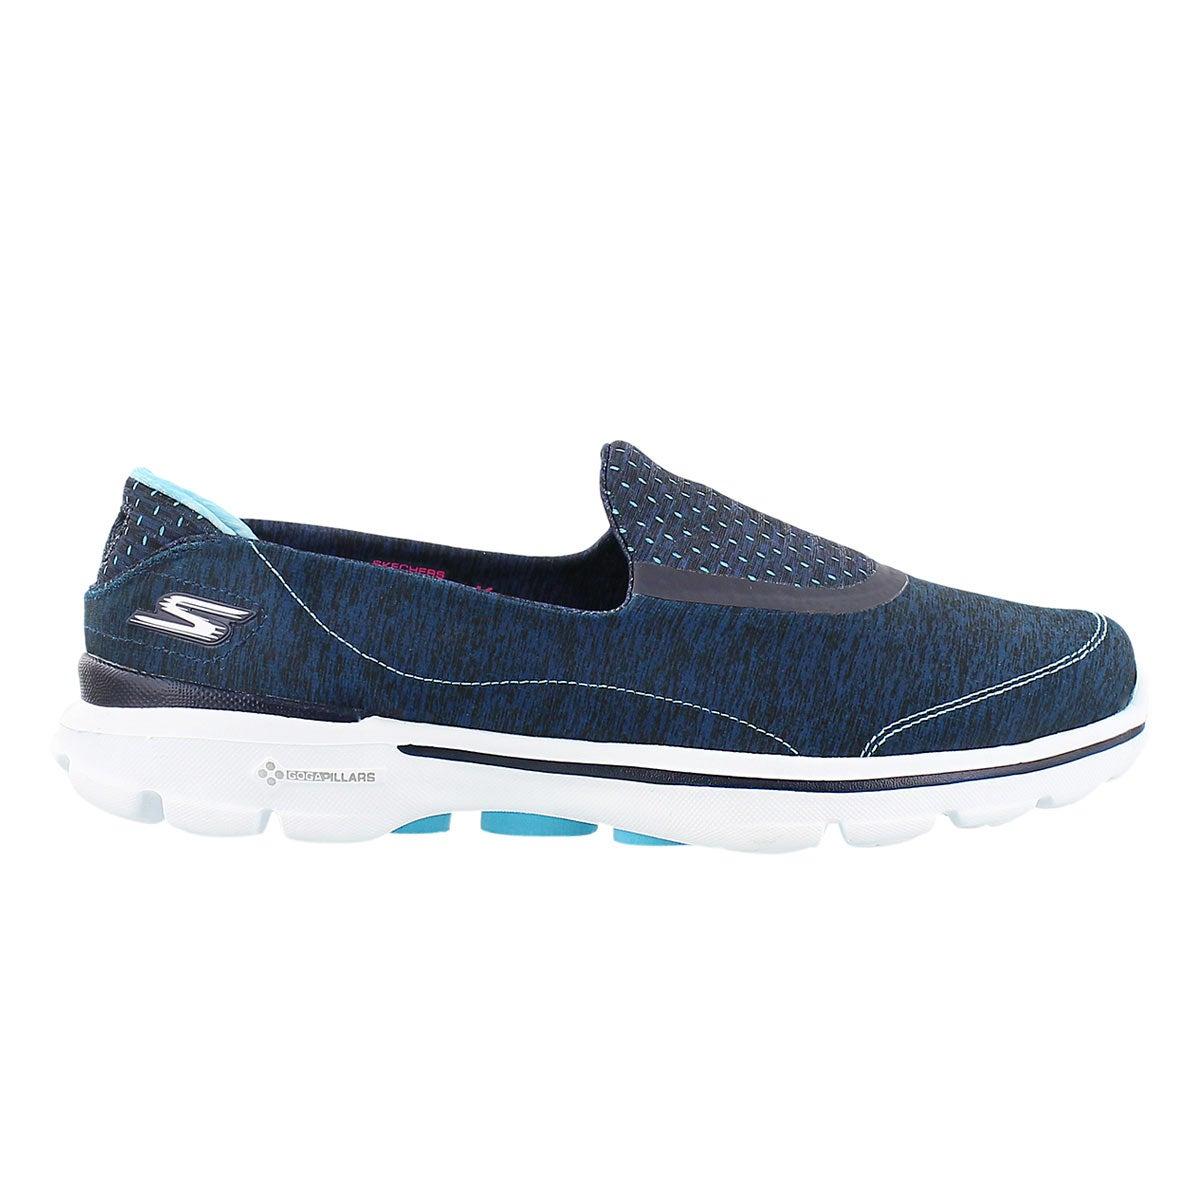 Lds GOwalk 3 Elevate blue slipon shoe